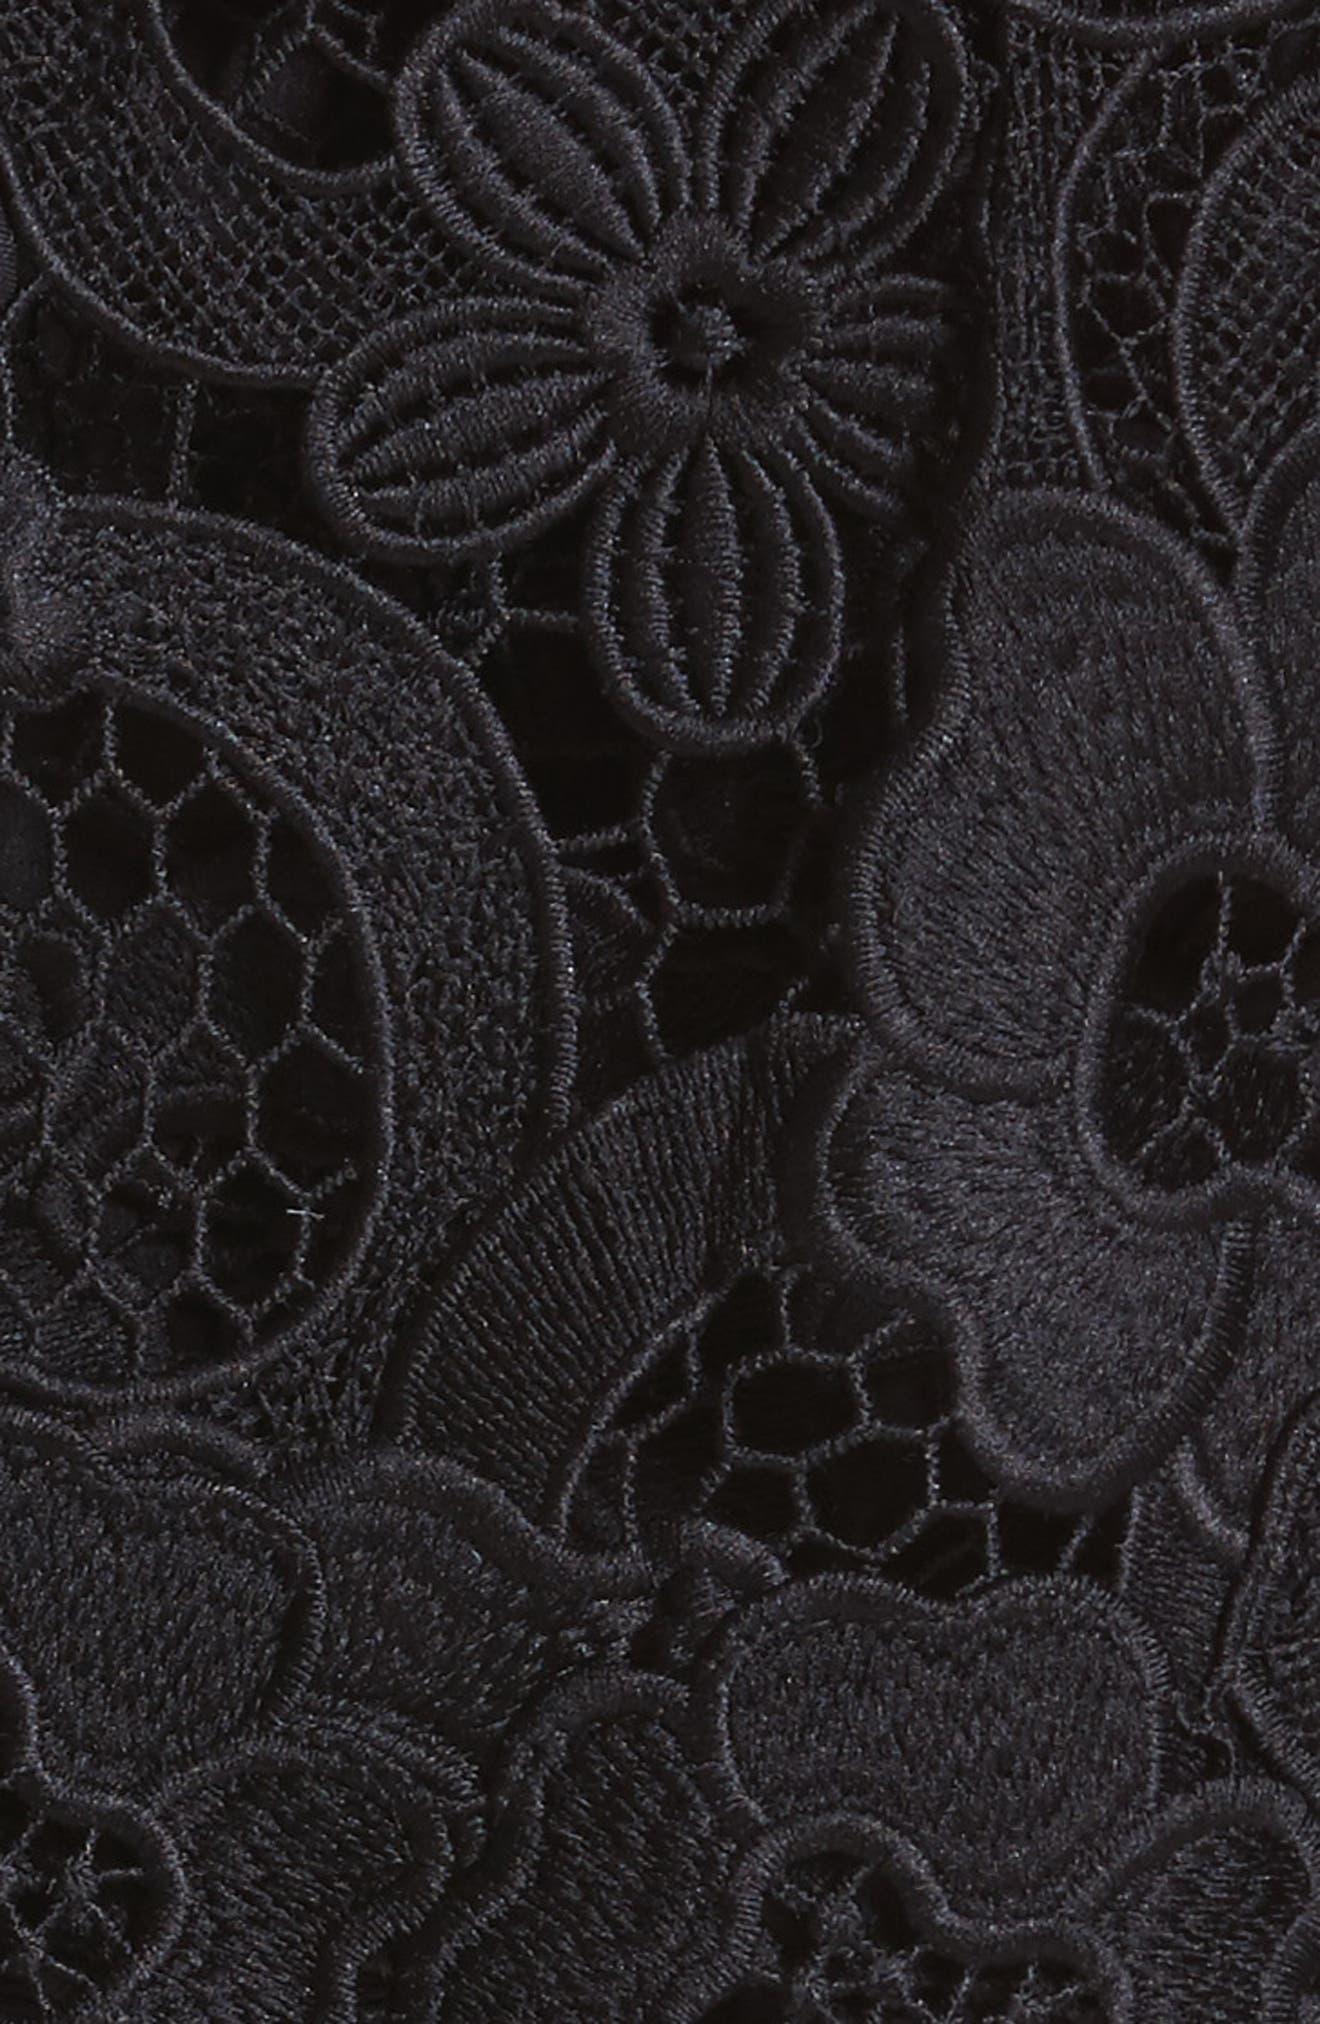 Lace Capelet Sheath Dress,                             Alternate thumbnail 5, color,                             001